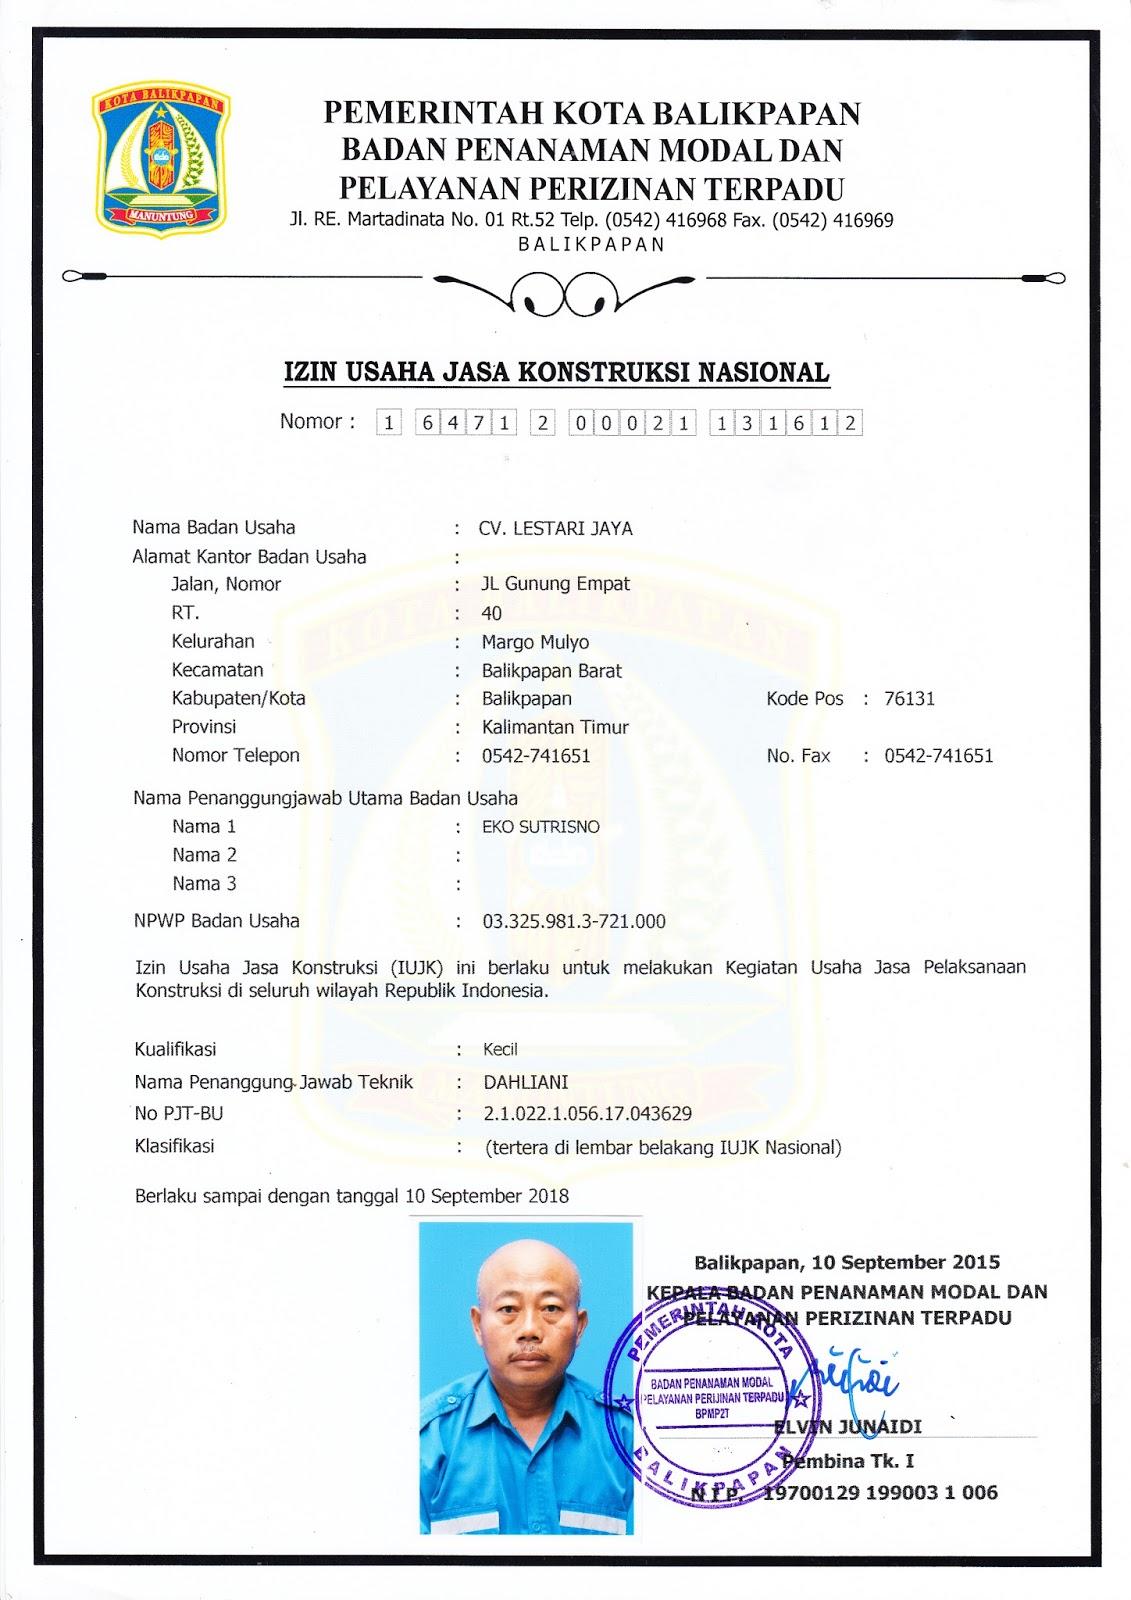 Cv Lestari Jaya Surat Izin Usaha Jasa Konstruksi